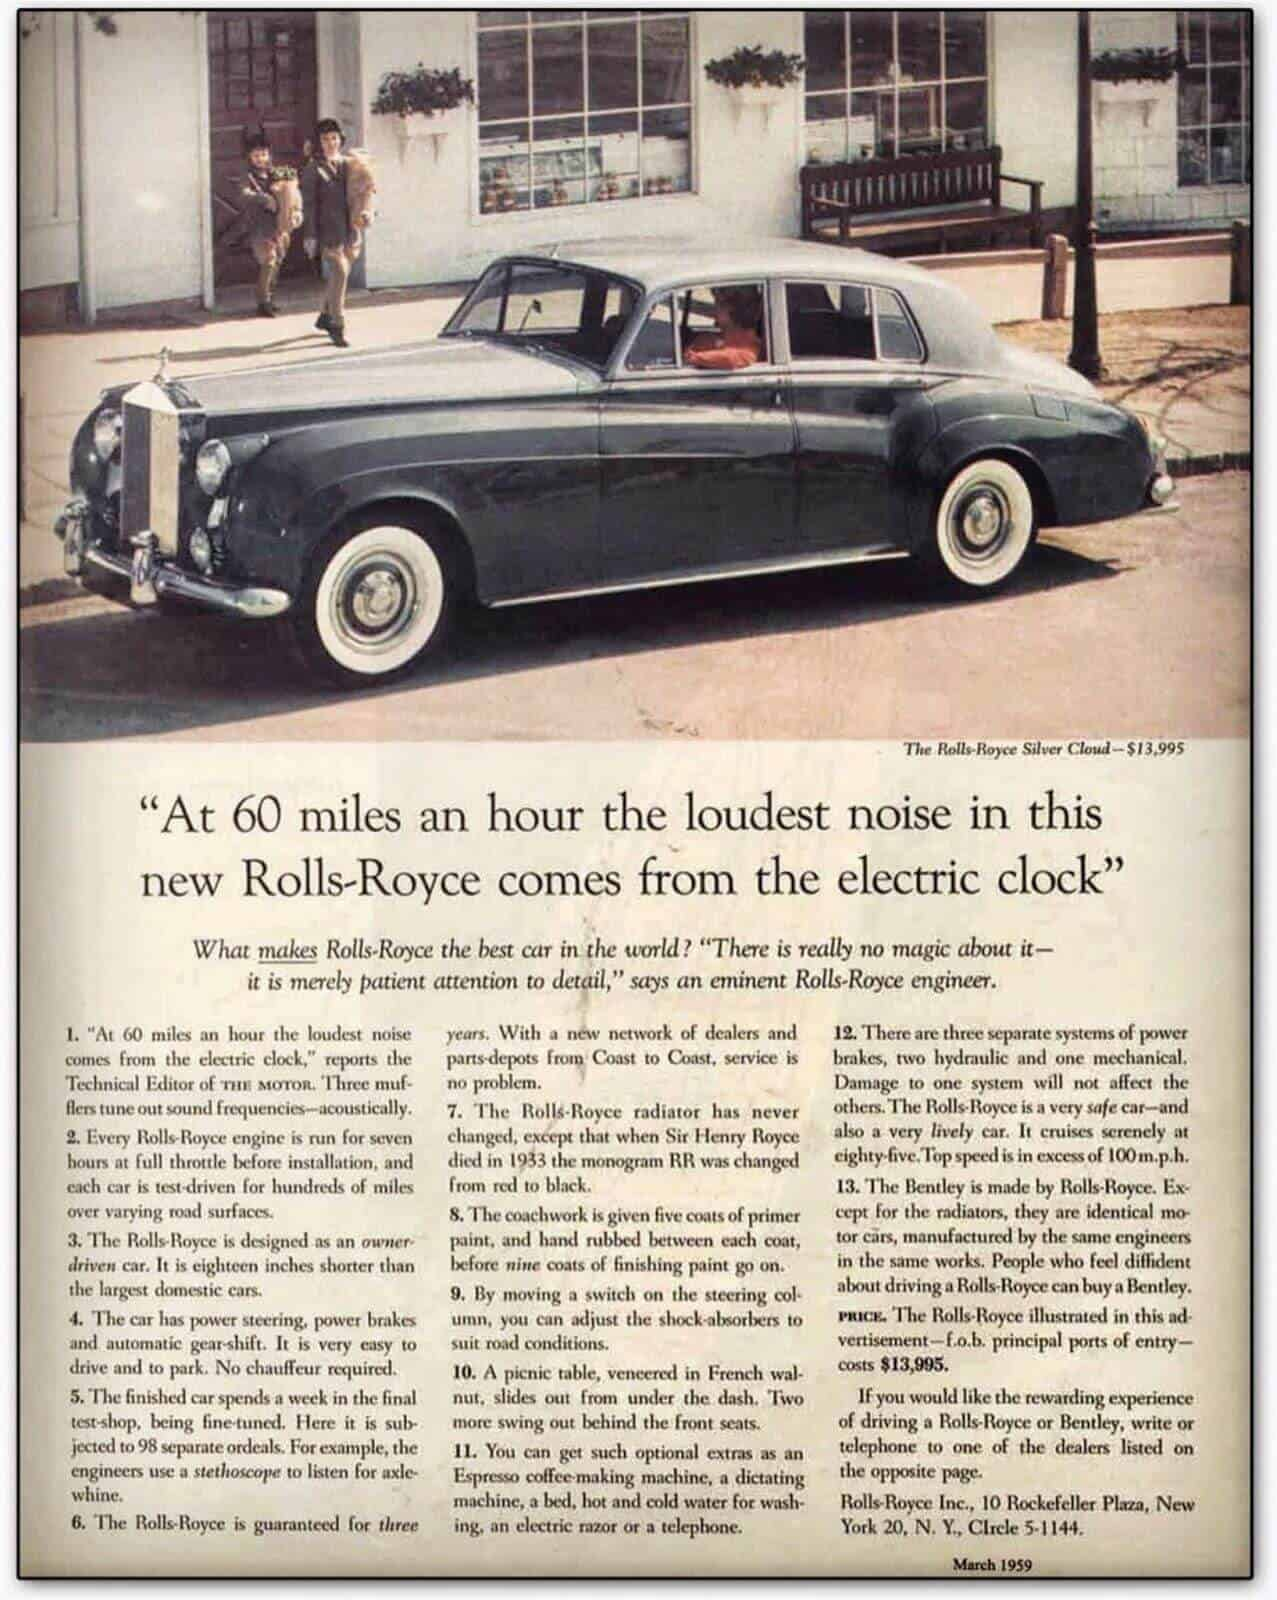 Rolls-Royce-Ad-Campaign-by-David-Ogilvy